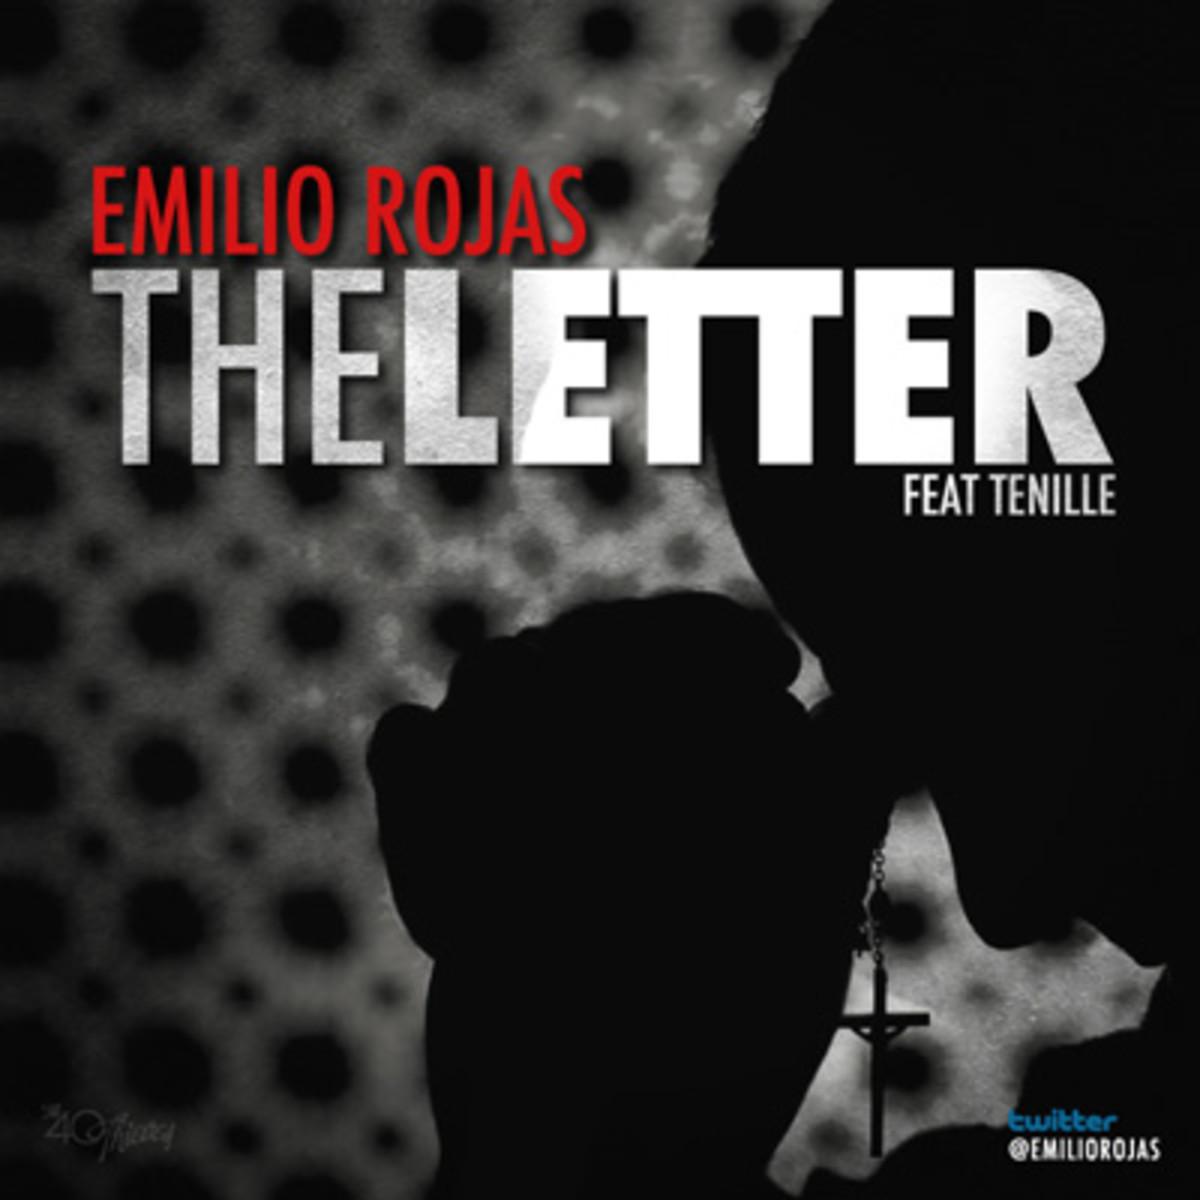 emiliorojas-theletter.jpg